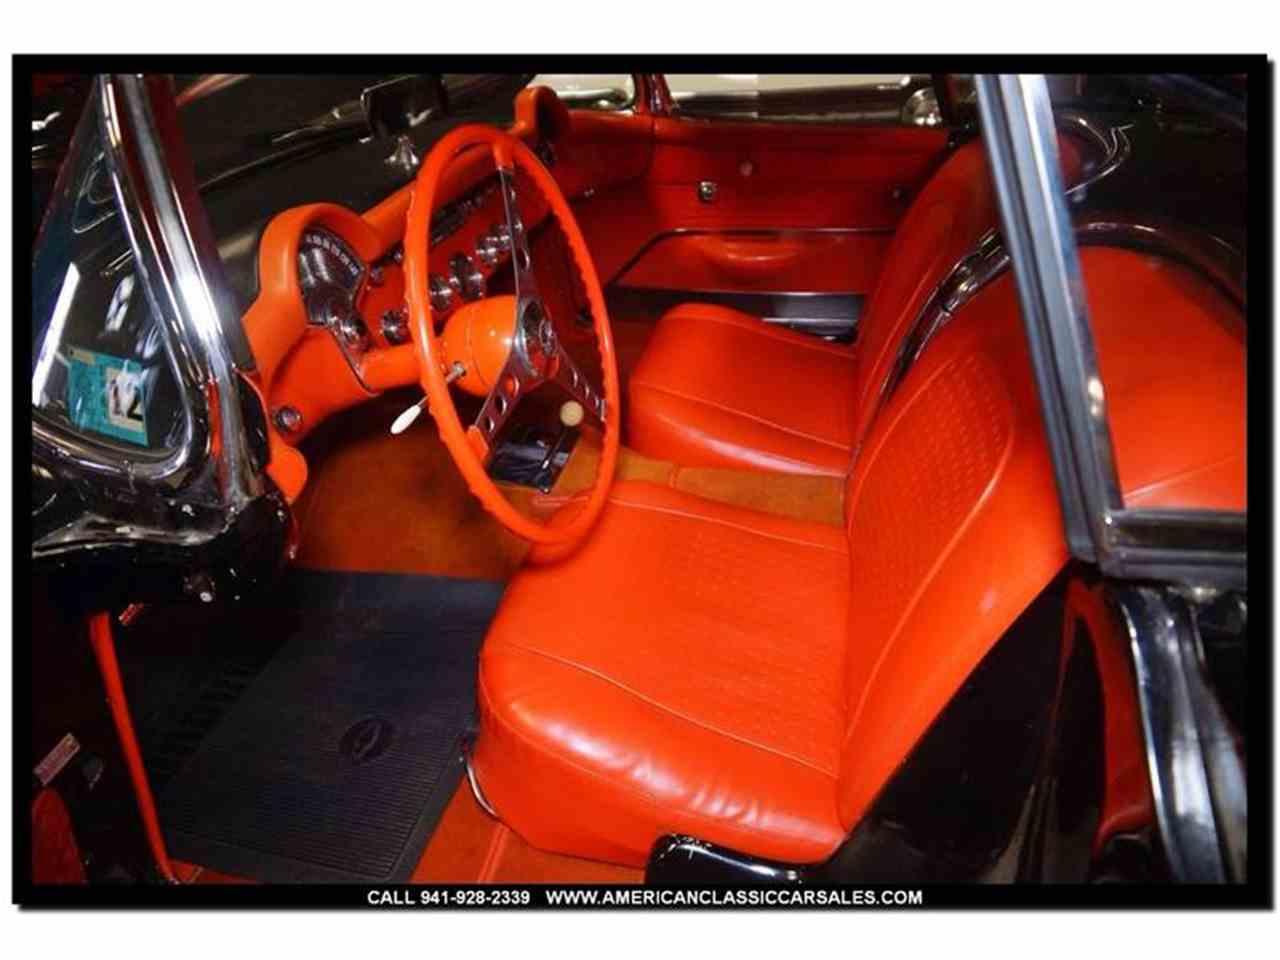 1957 chevrolet corvette for sale on classiccars com 31 - Photo 16